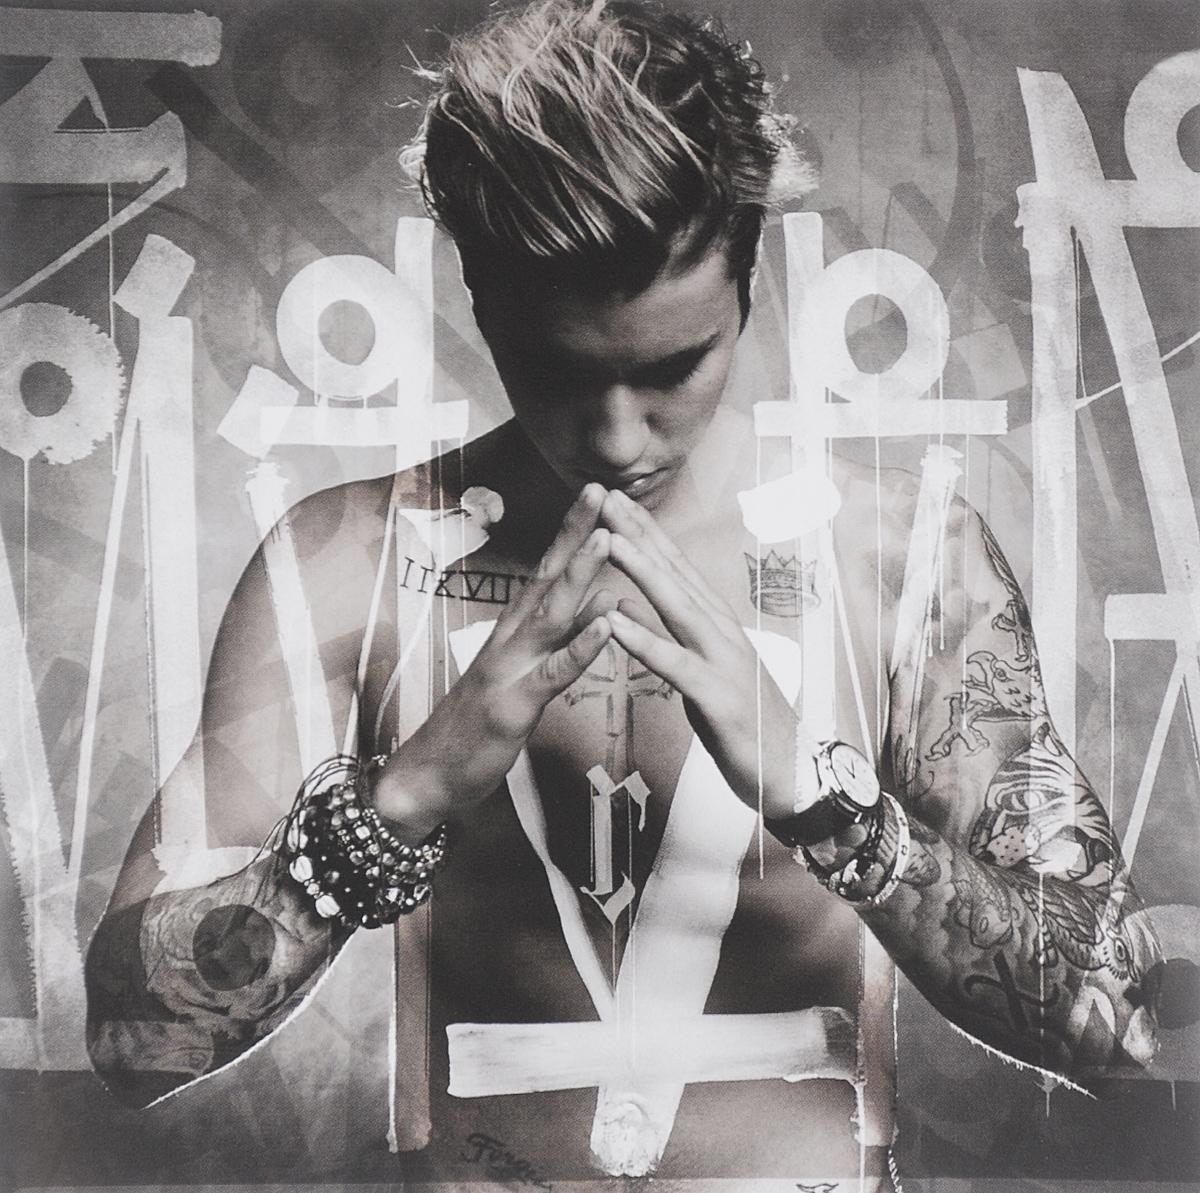 Justin Bieber. Purpose